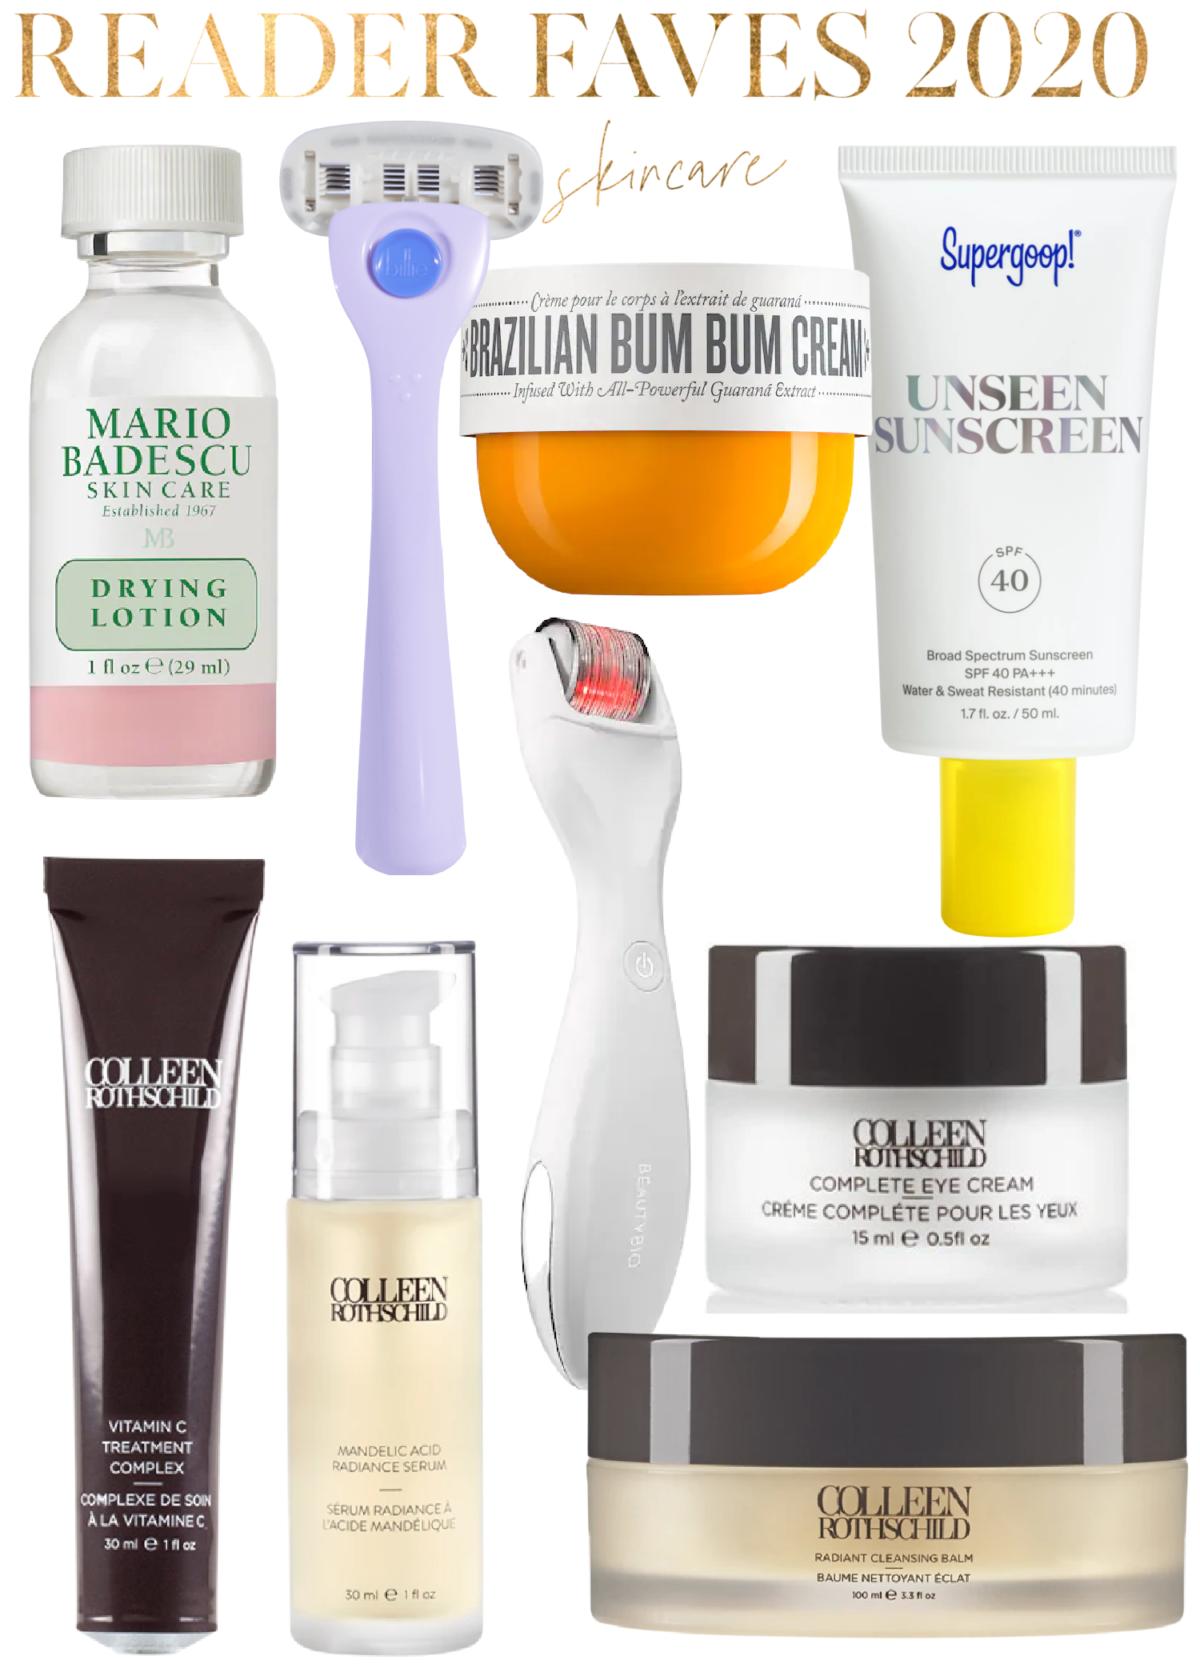 Reader Faves 2020 | Skincare